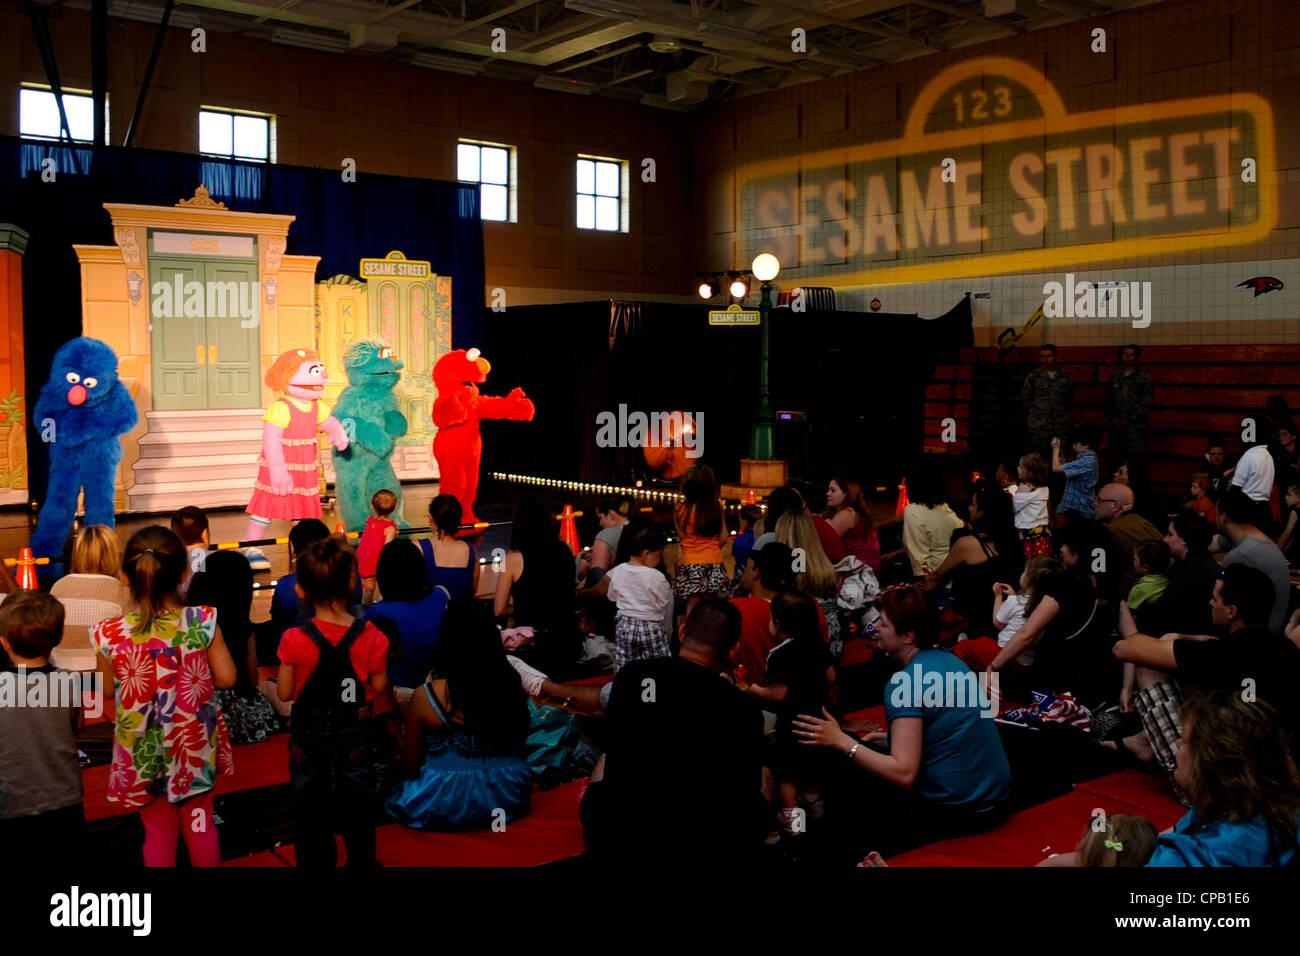 Sesame Street Stock Photos & Sesame Street Stock Images - Alamy